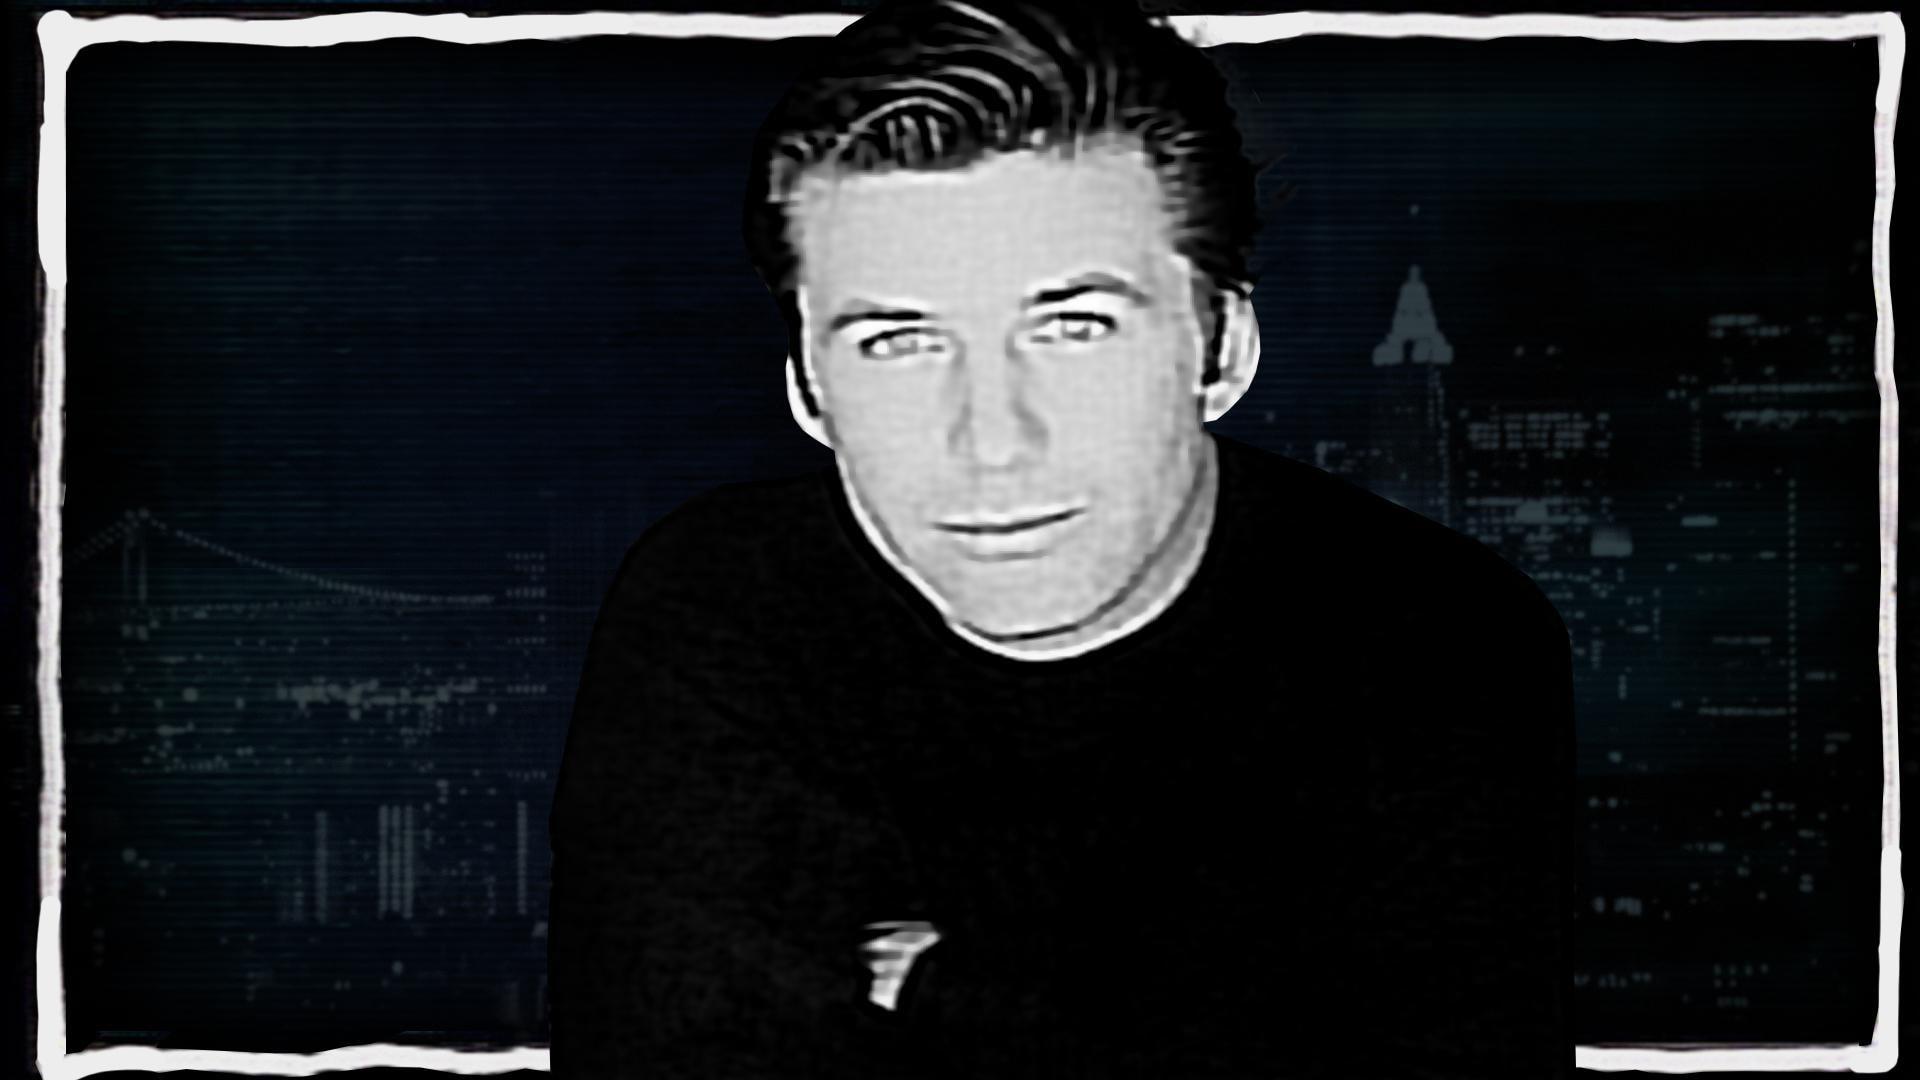 Alec Baldwin: April 21, 1990